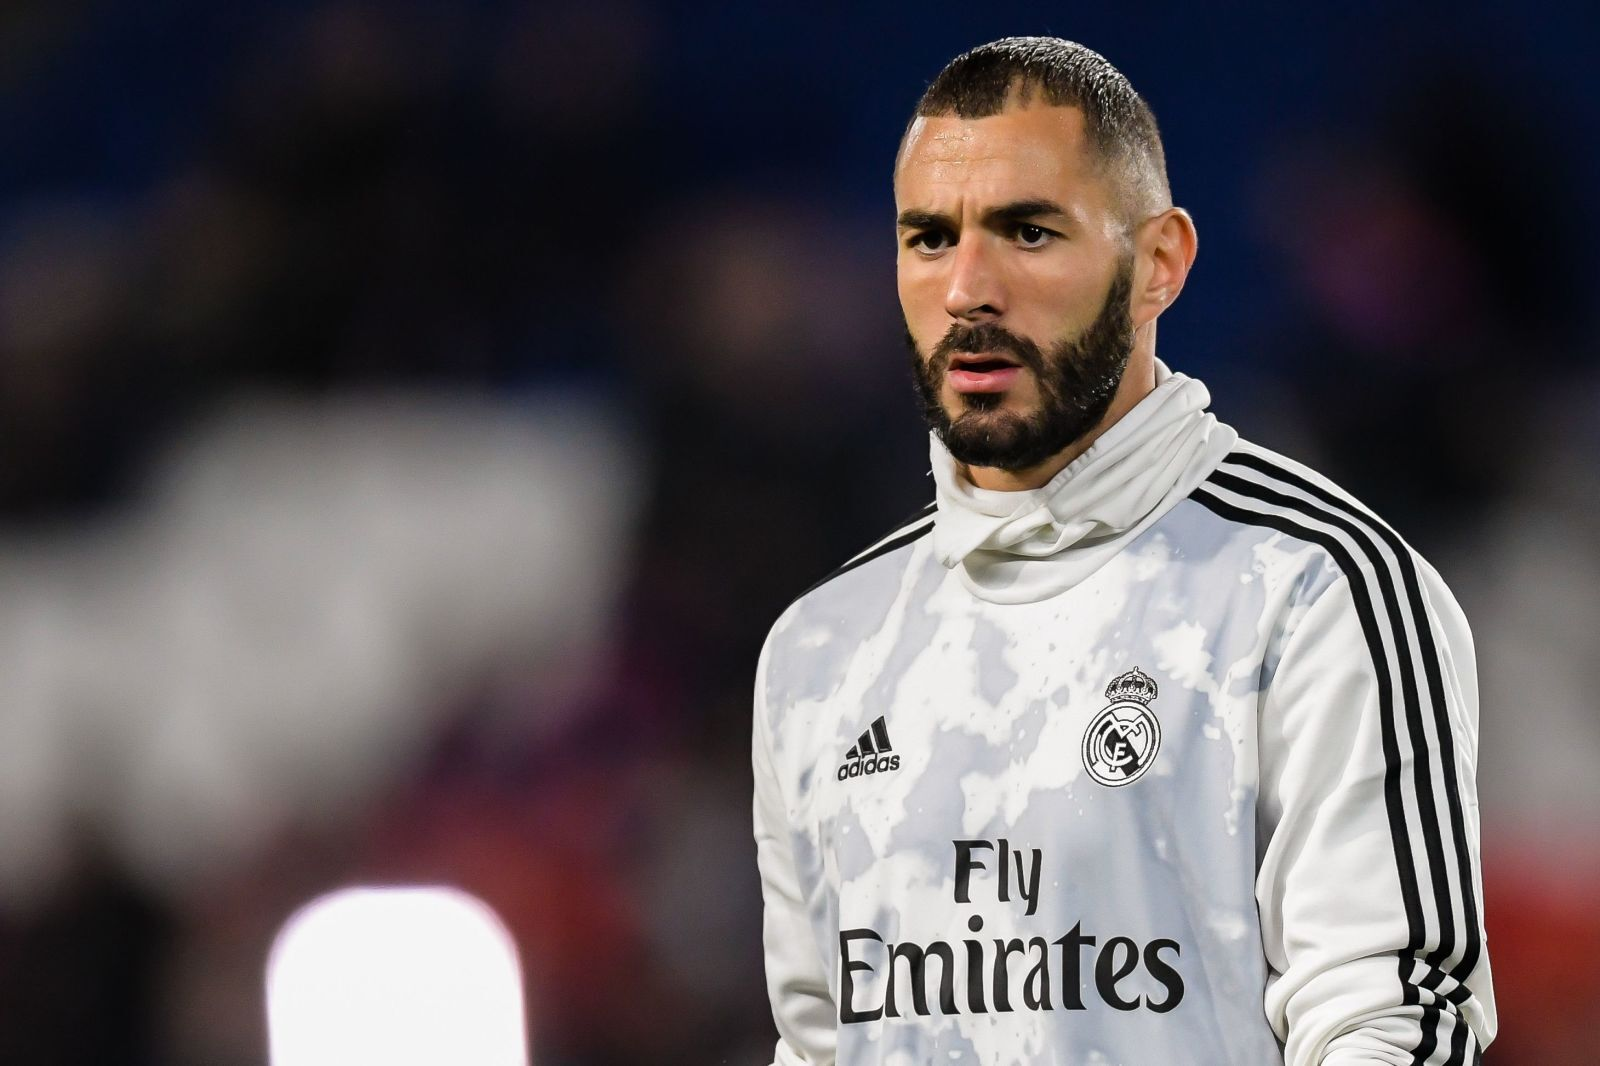 Real Madrid: Will Karim Benzema prove big-game critics wrong against Sevilla?